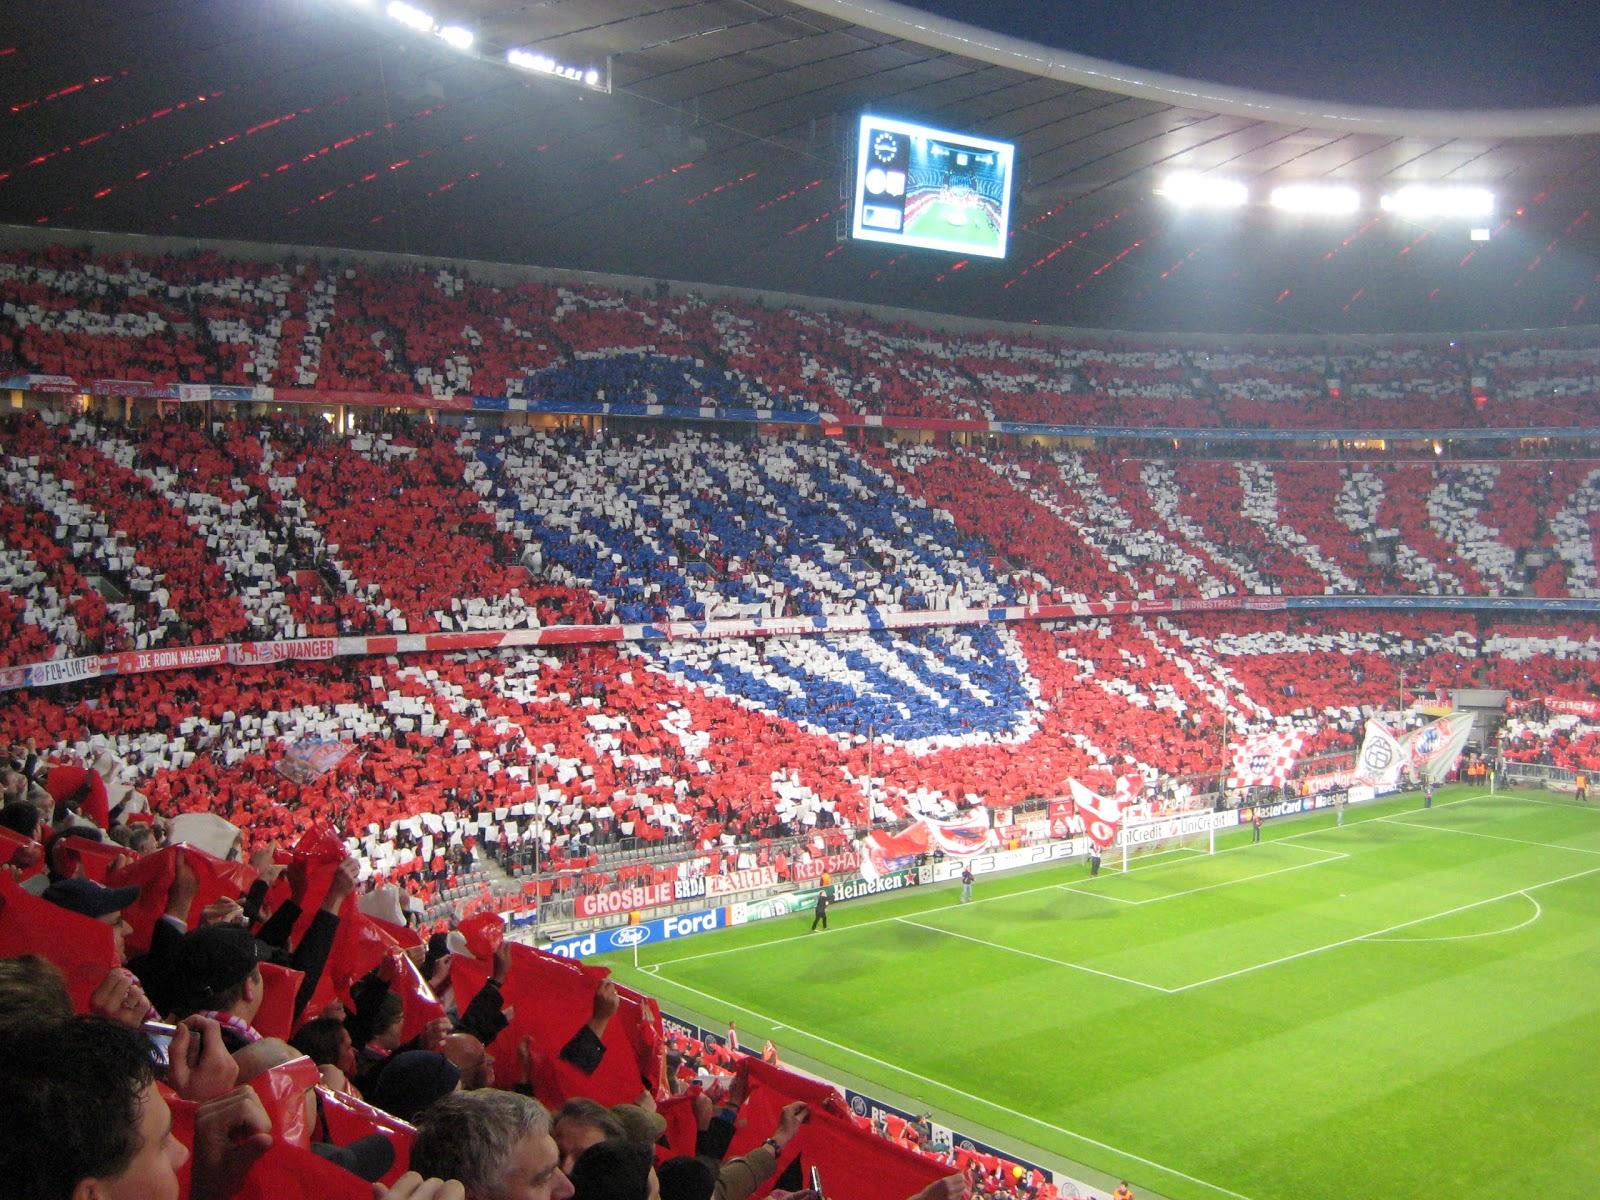 Bayern München and Allianz Arena | Awin Language